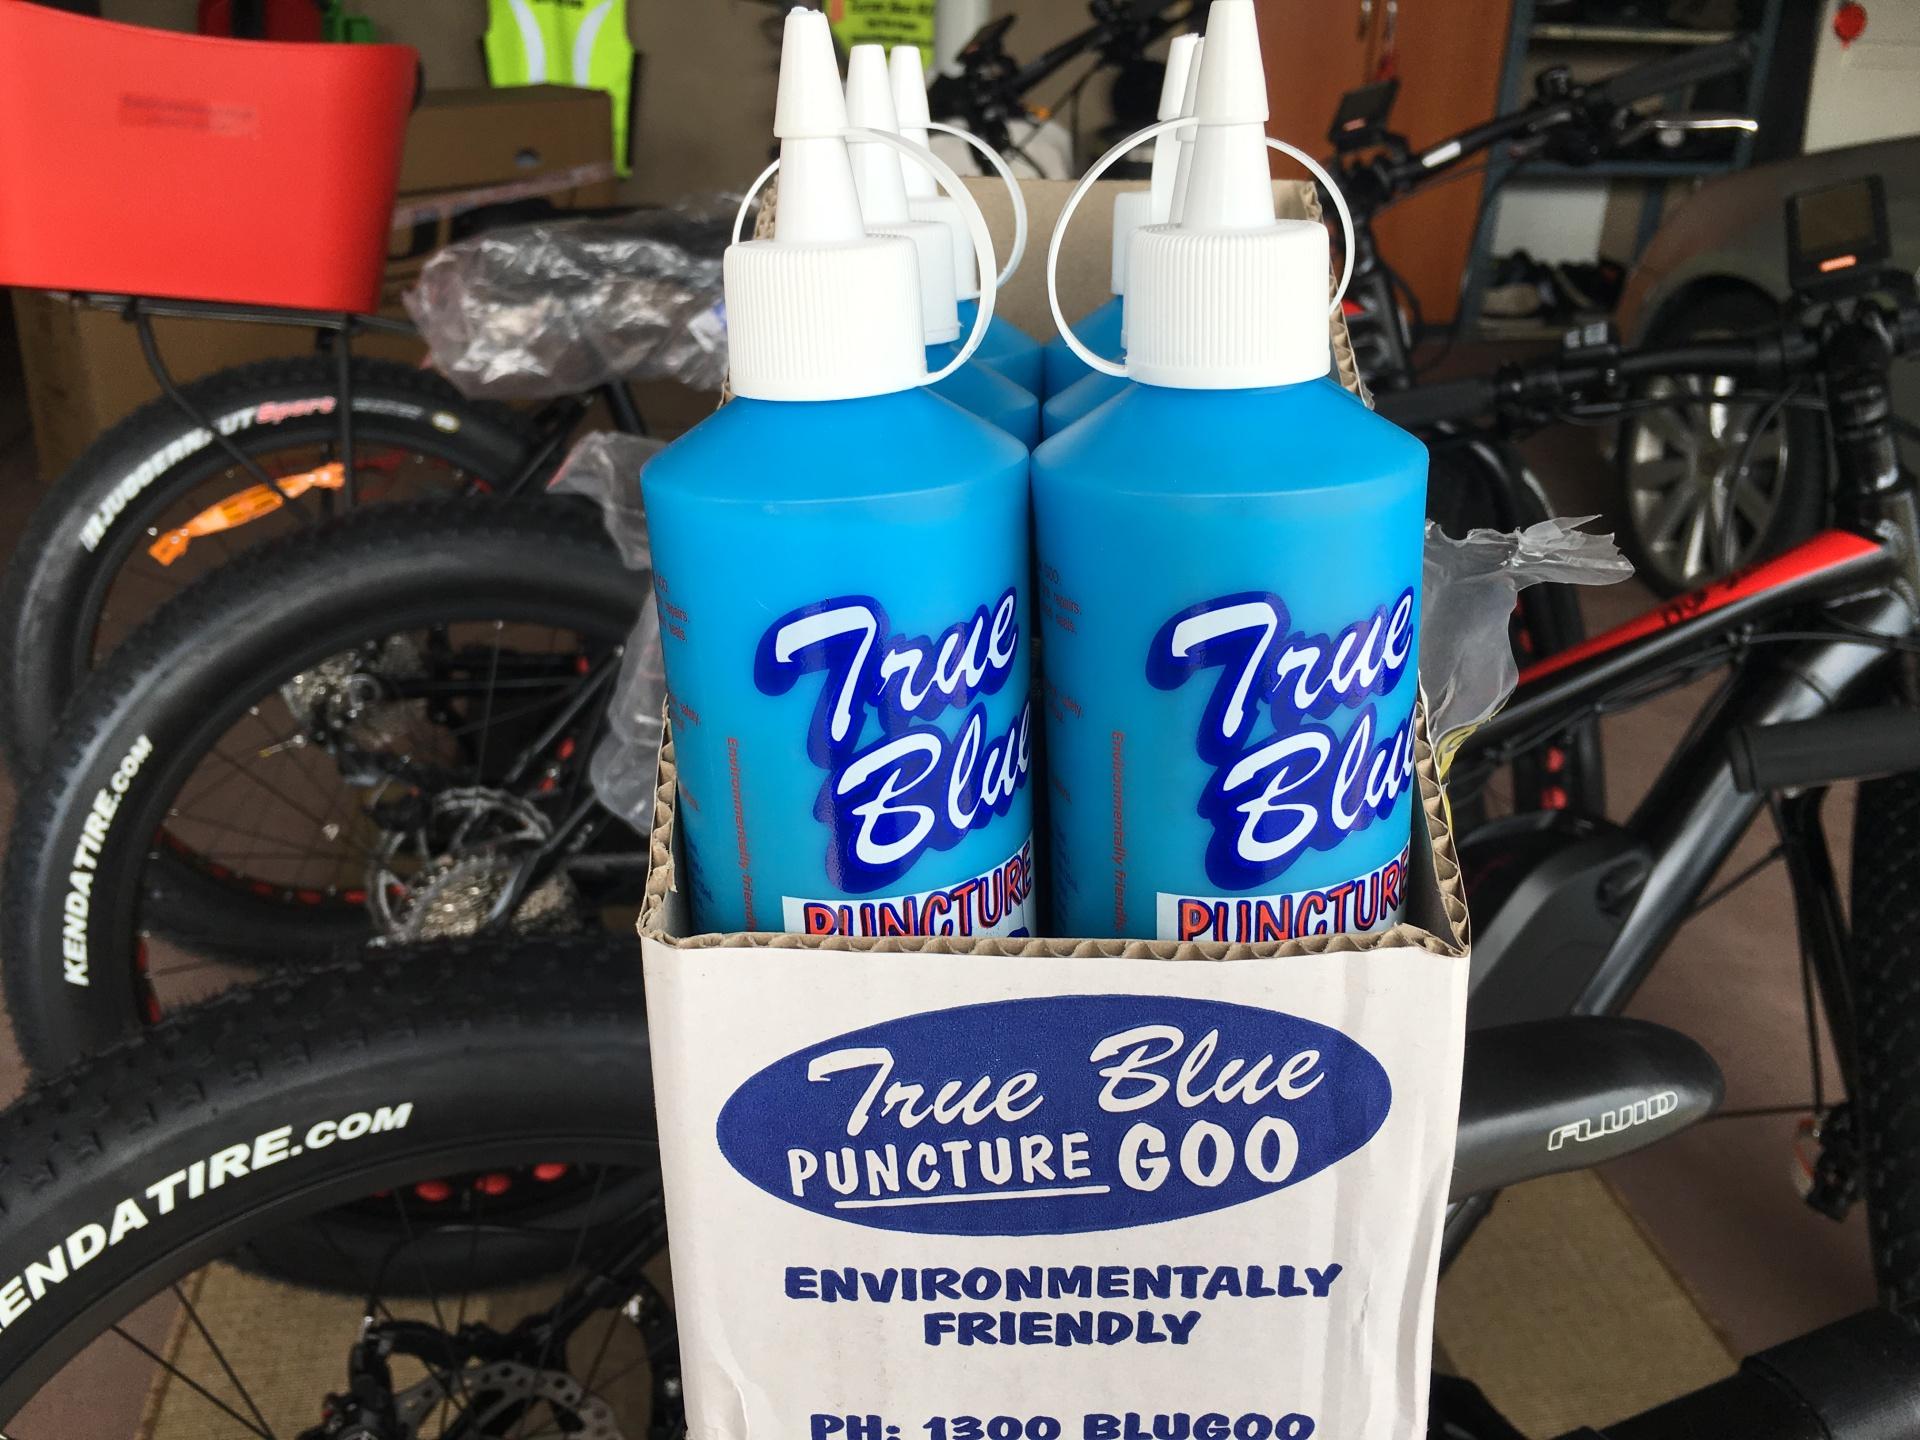 Electric Bikes - Tyre Puncture Repair Goo - 0417400040